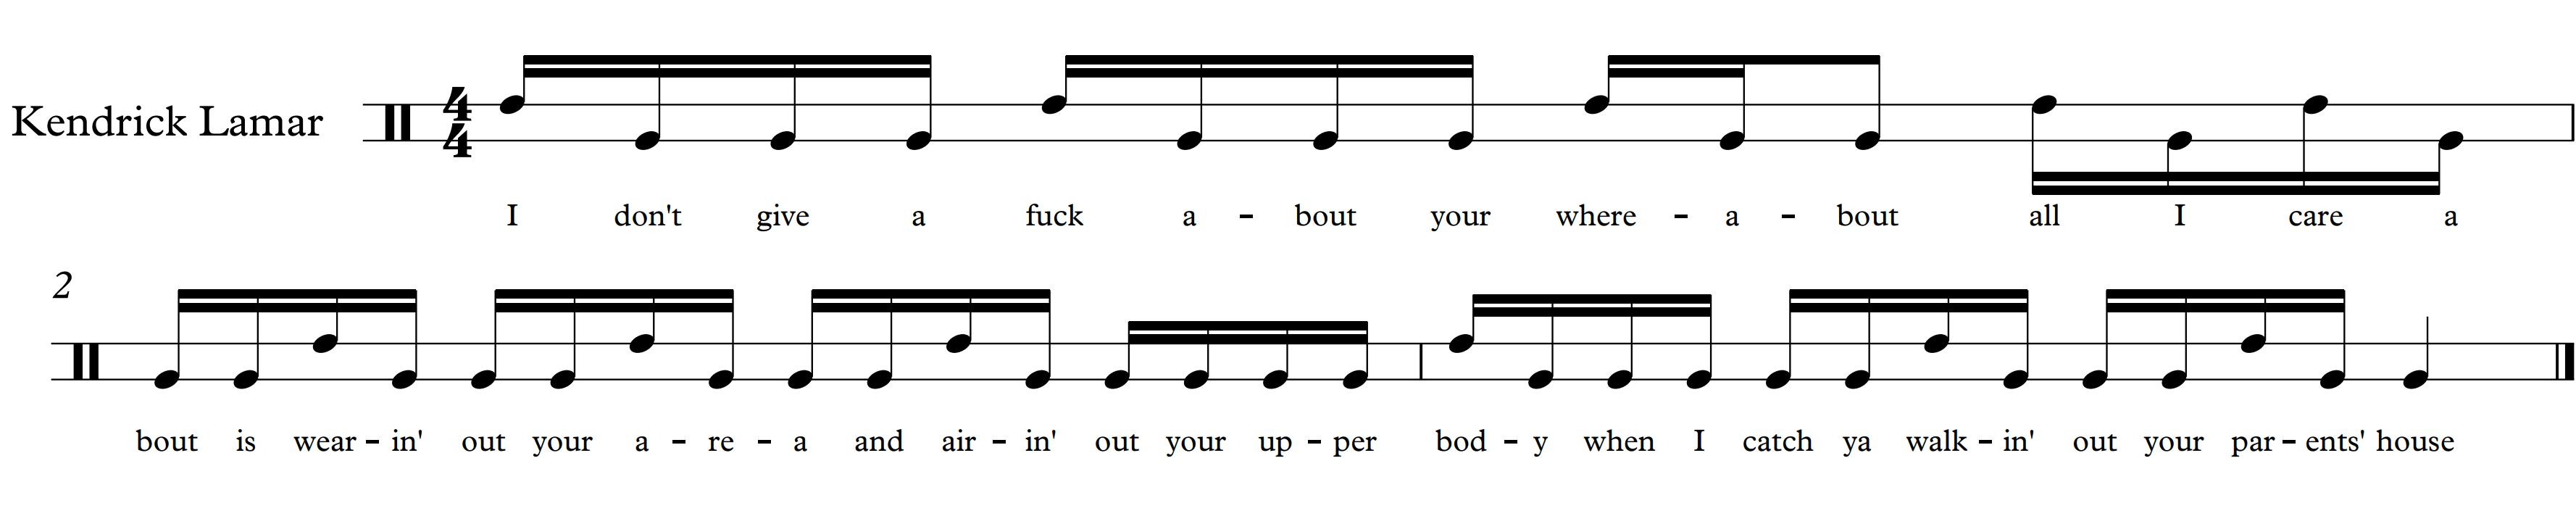 Komaniecki, Example 12a